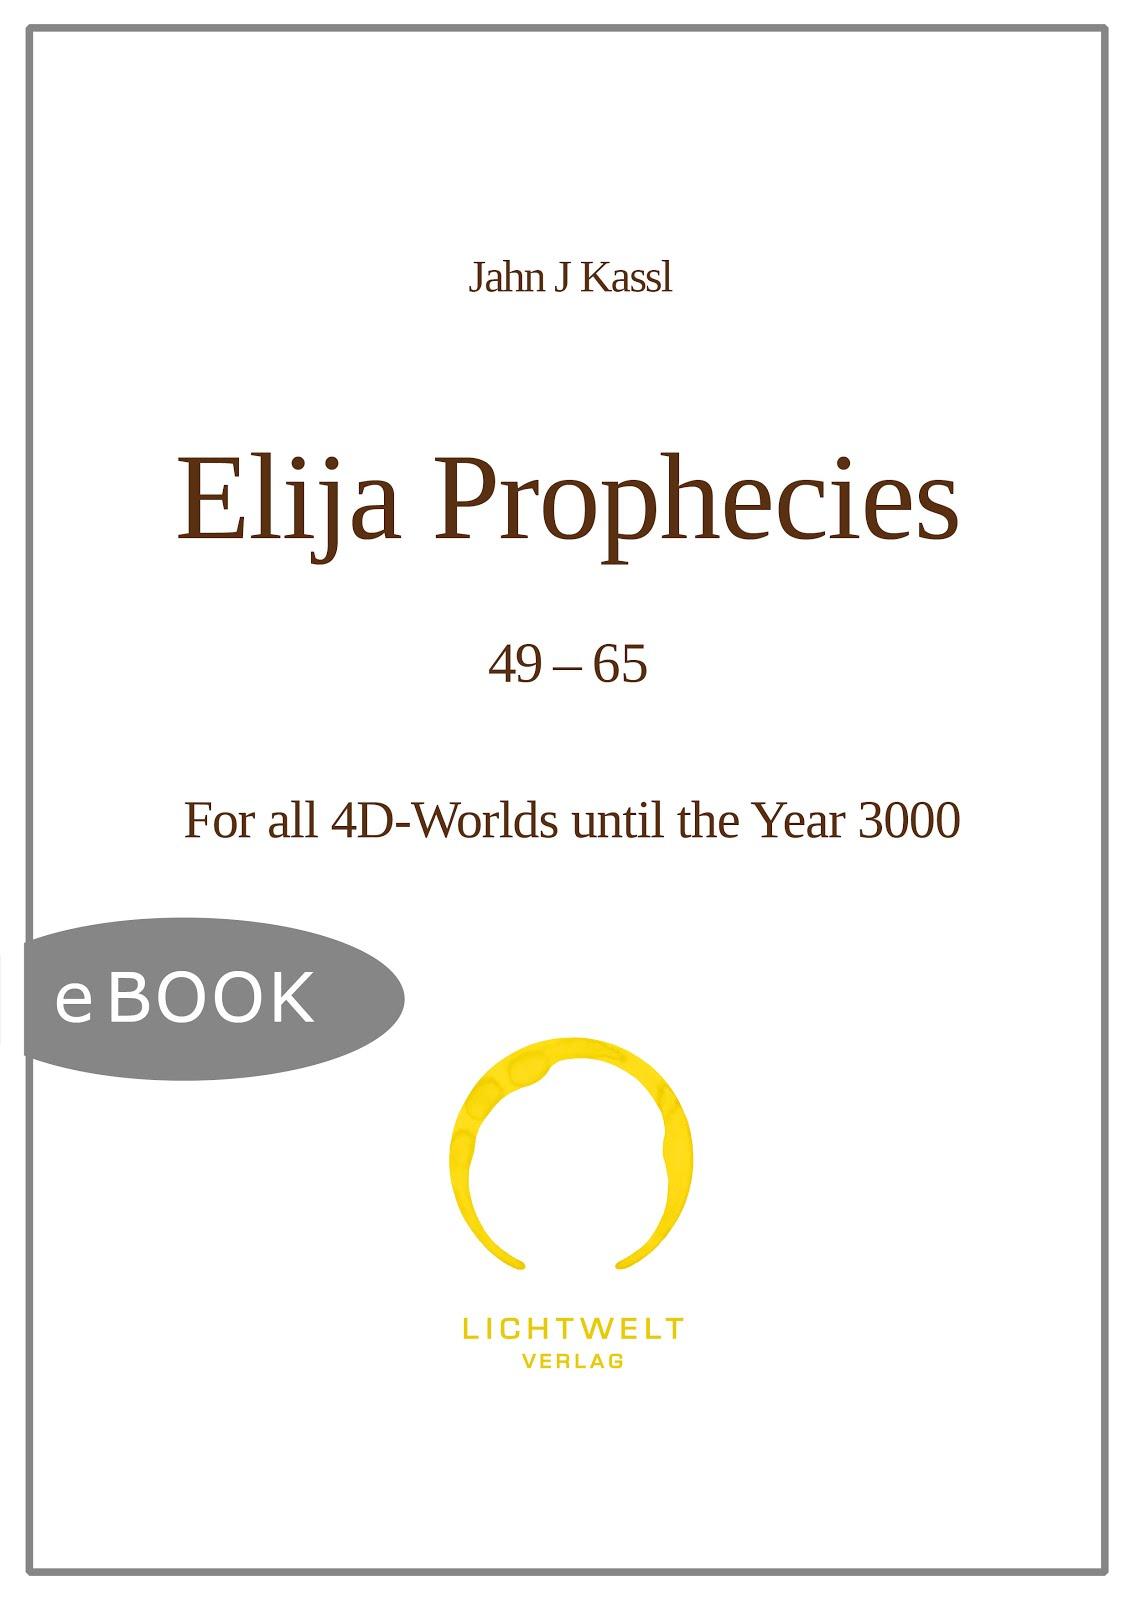 Elija Prophecies 49-65 - JJK (digital publication)